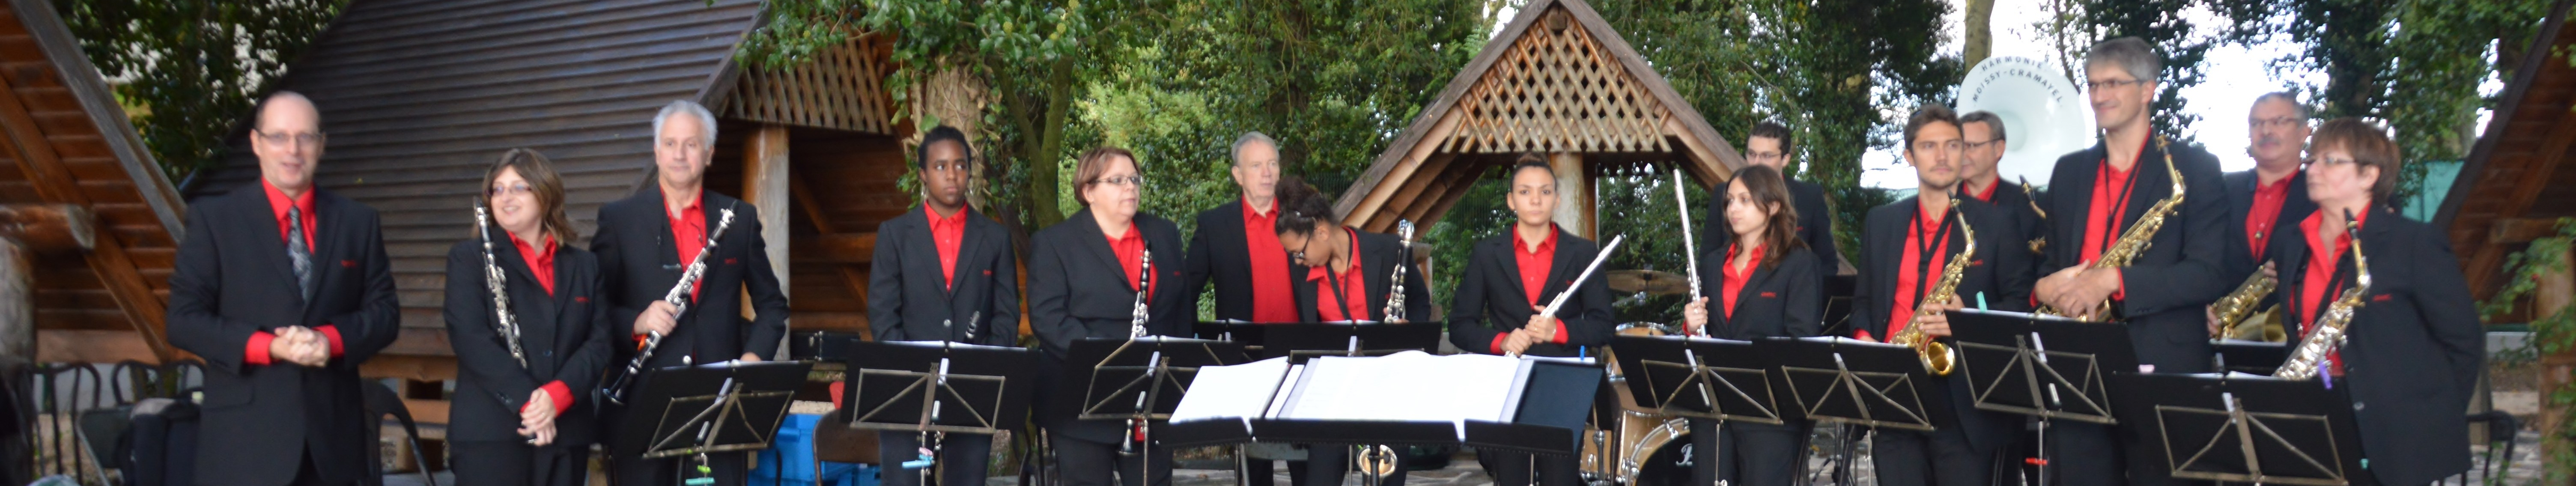 L'Orchestre d'Harmonie de Moissy-Cramayel